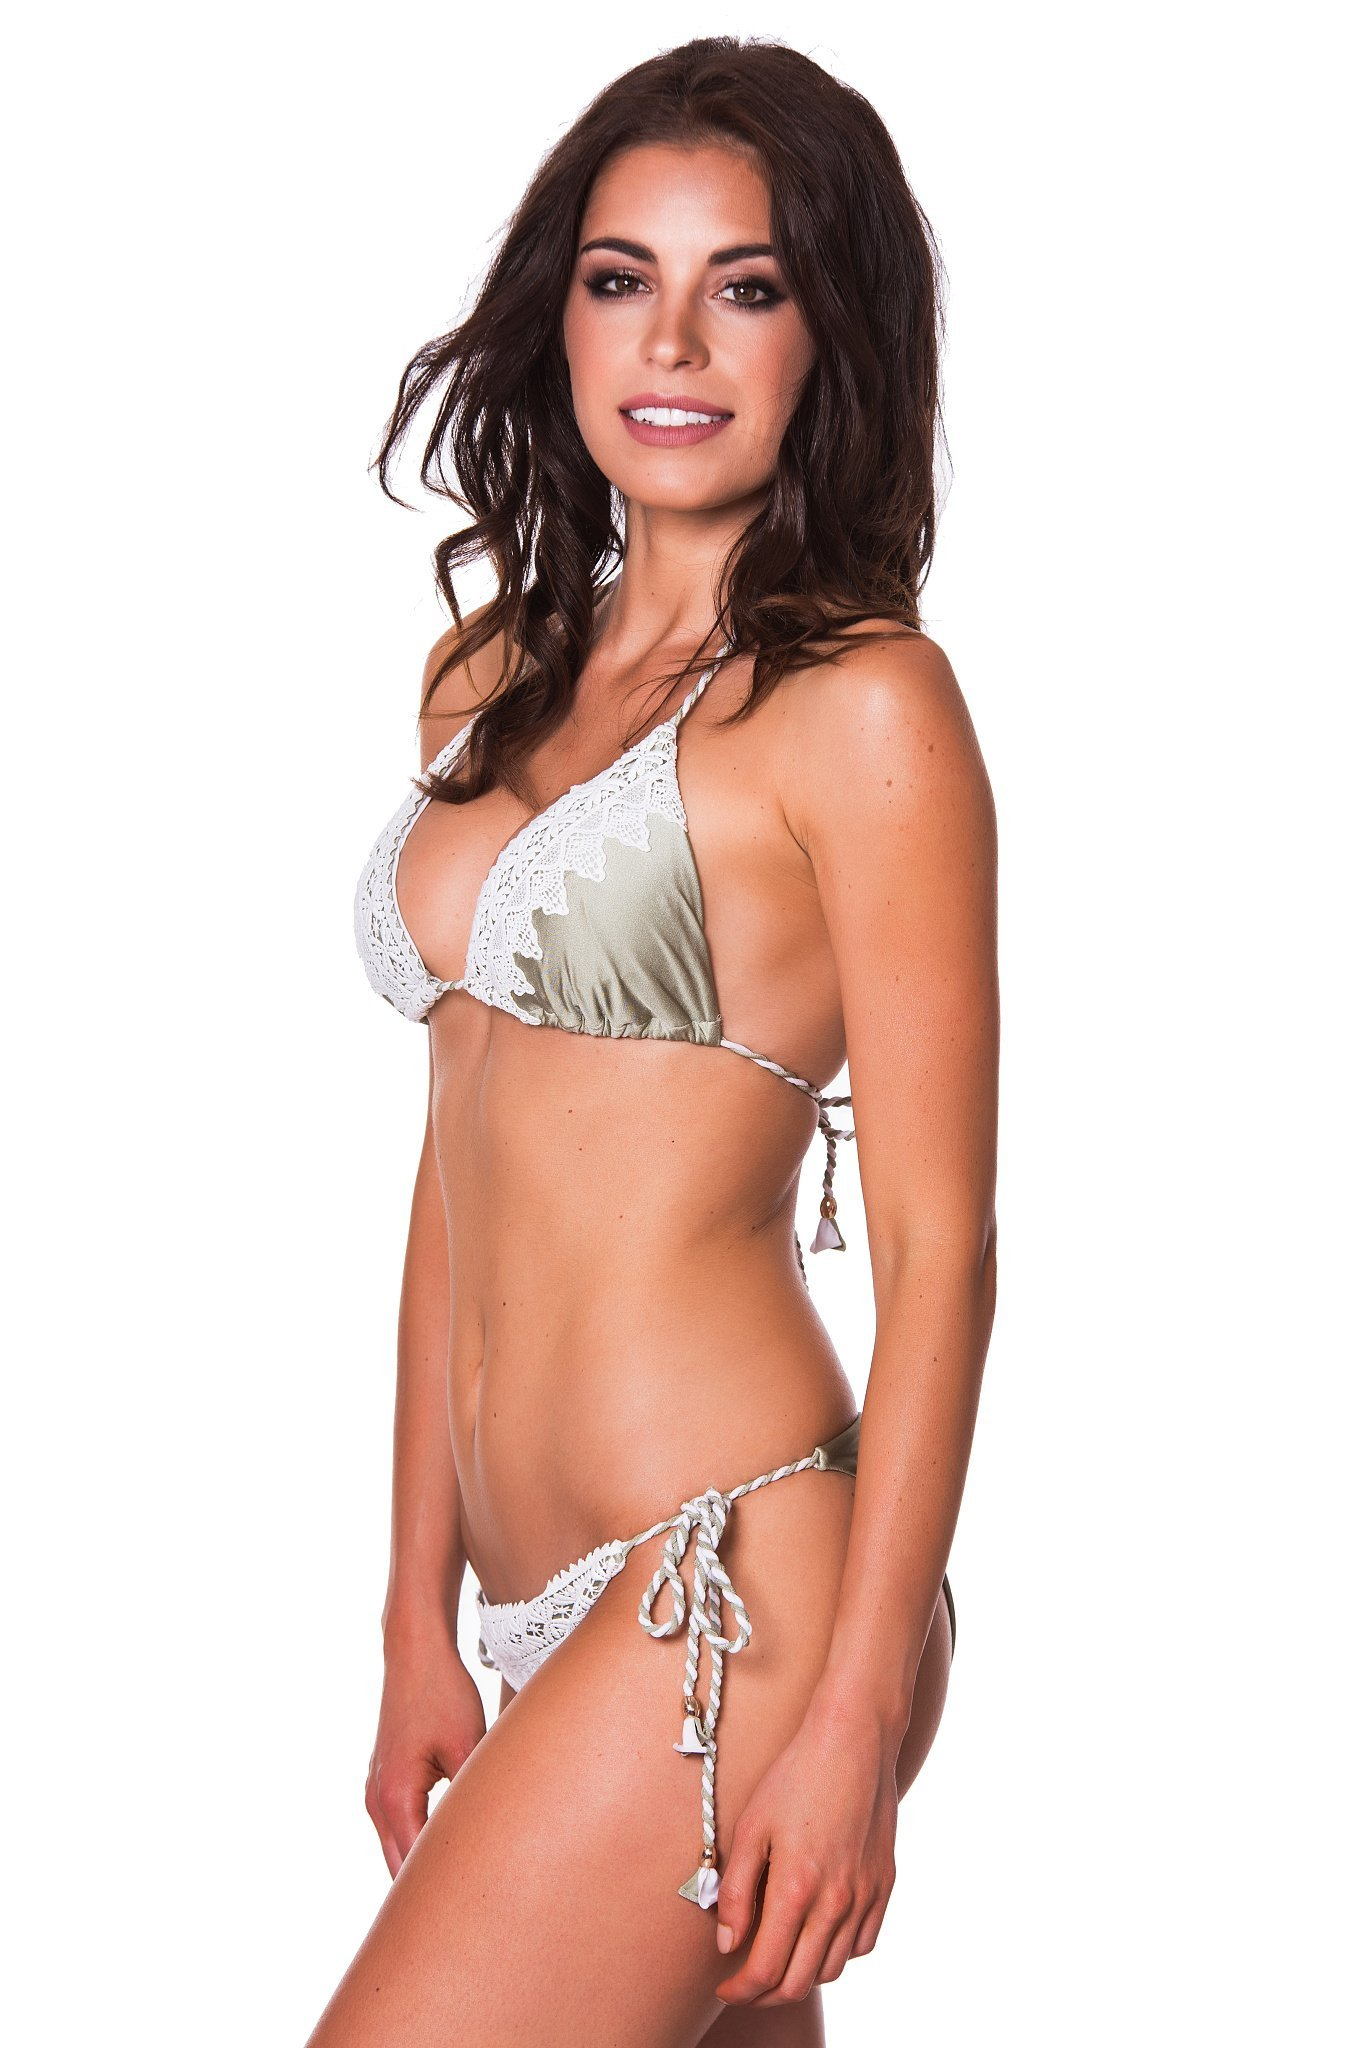 RELLECIGA Damen Bademode Triangel Bikini Set Unterteil im Brasil Style  Spitze Crochet 6386cfdeab